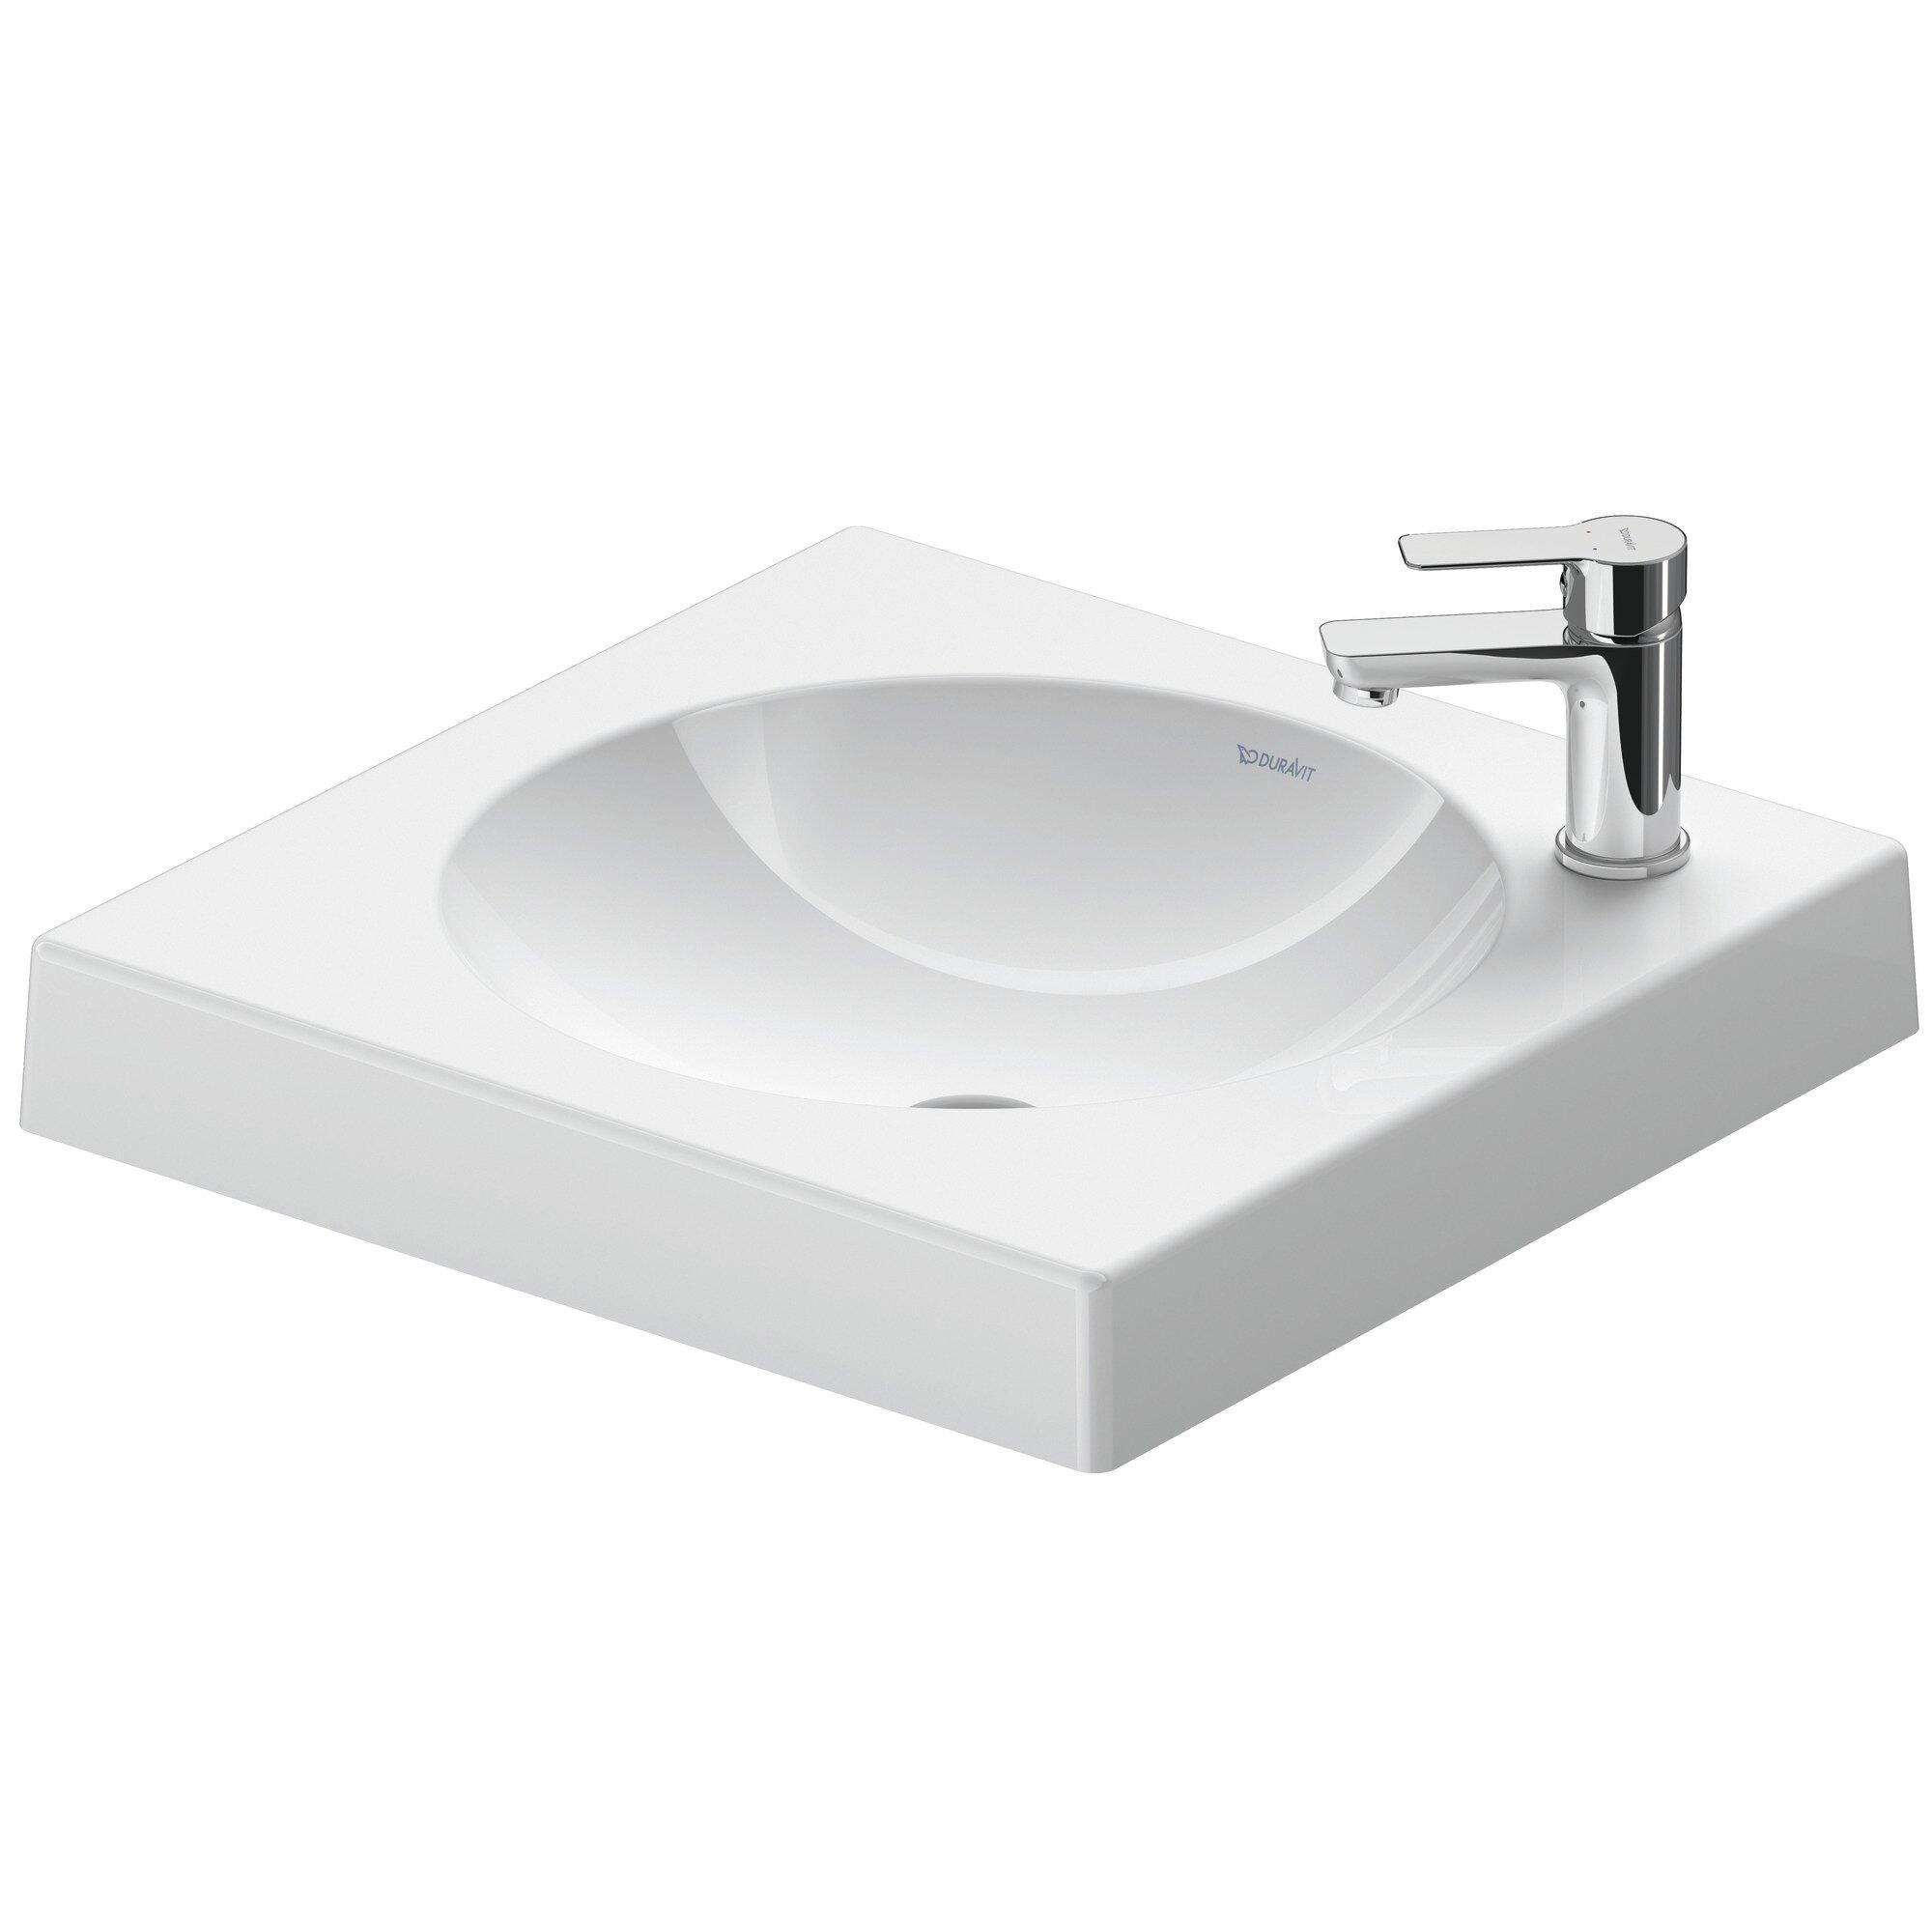 Duravit Architec White Ceramic Rectangular Vessel Bathroom Sink Wayfair